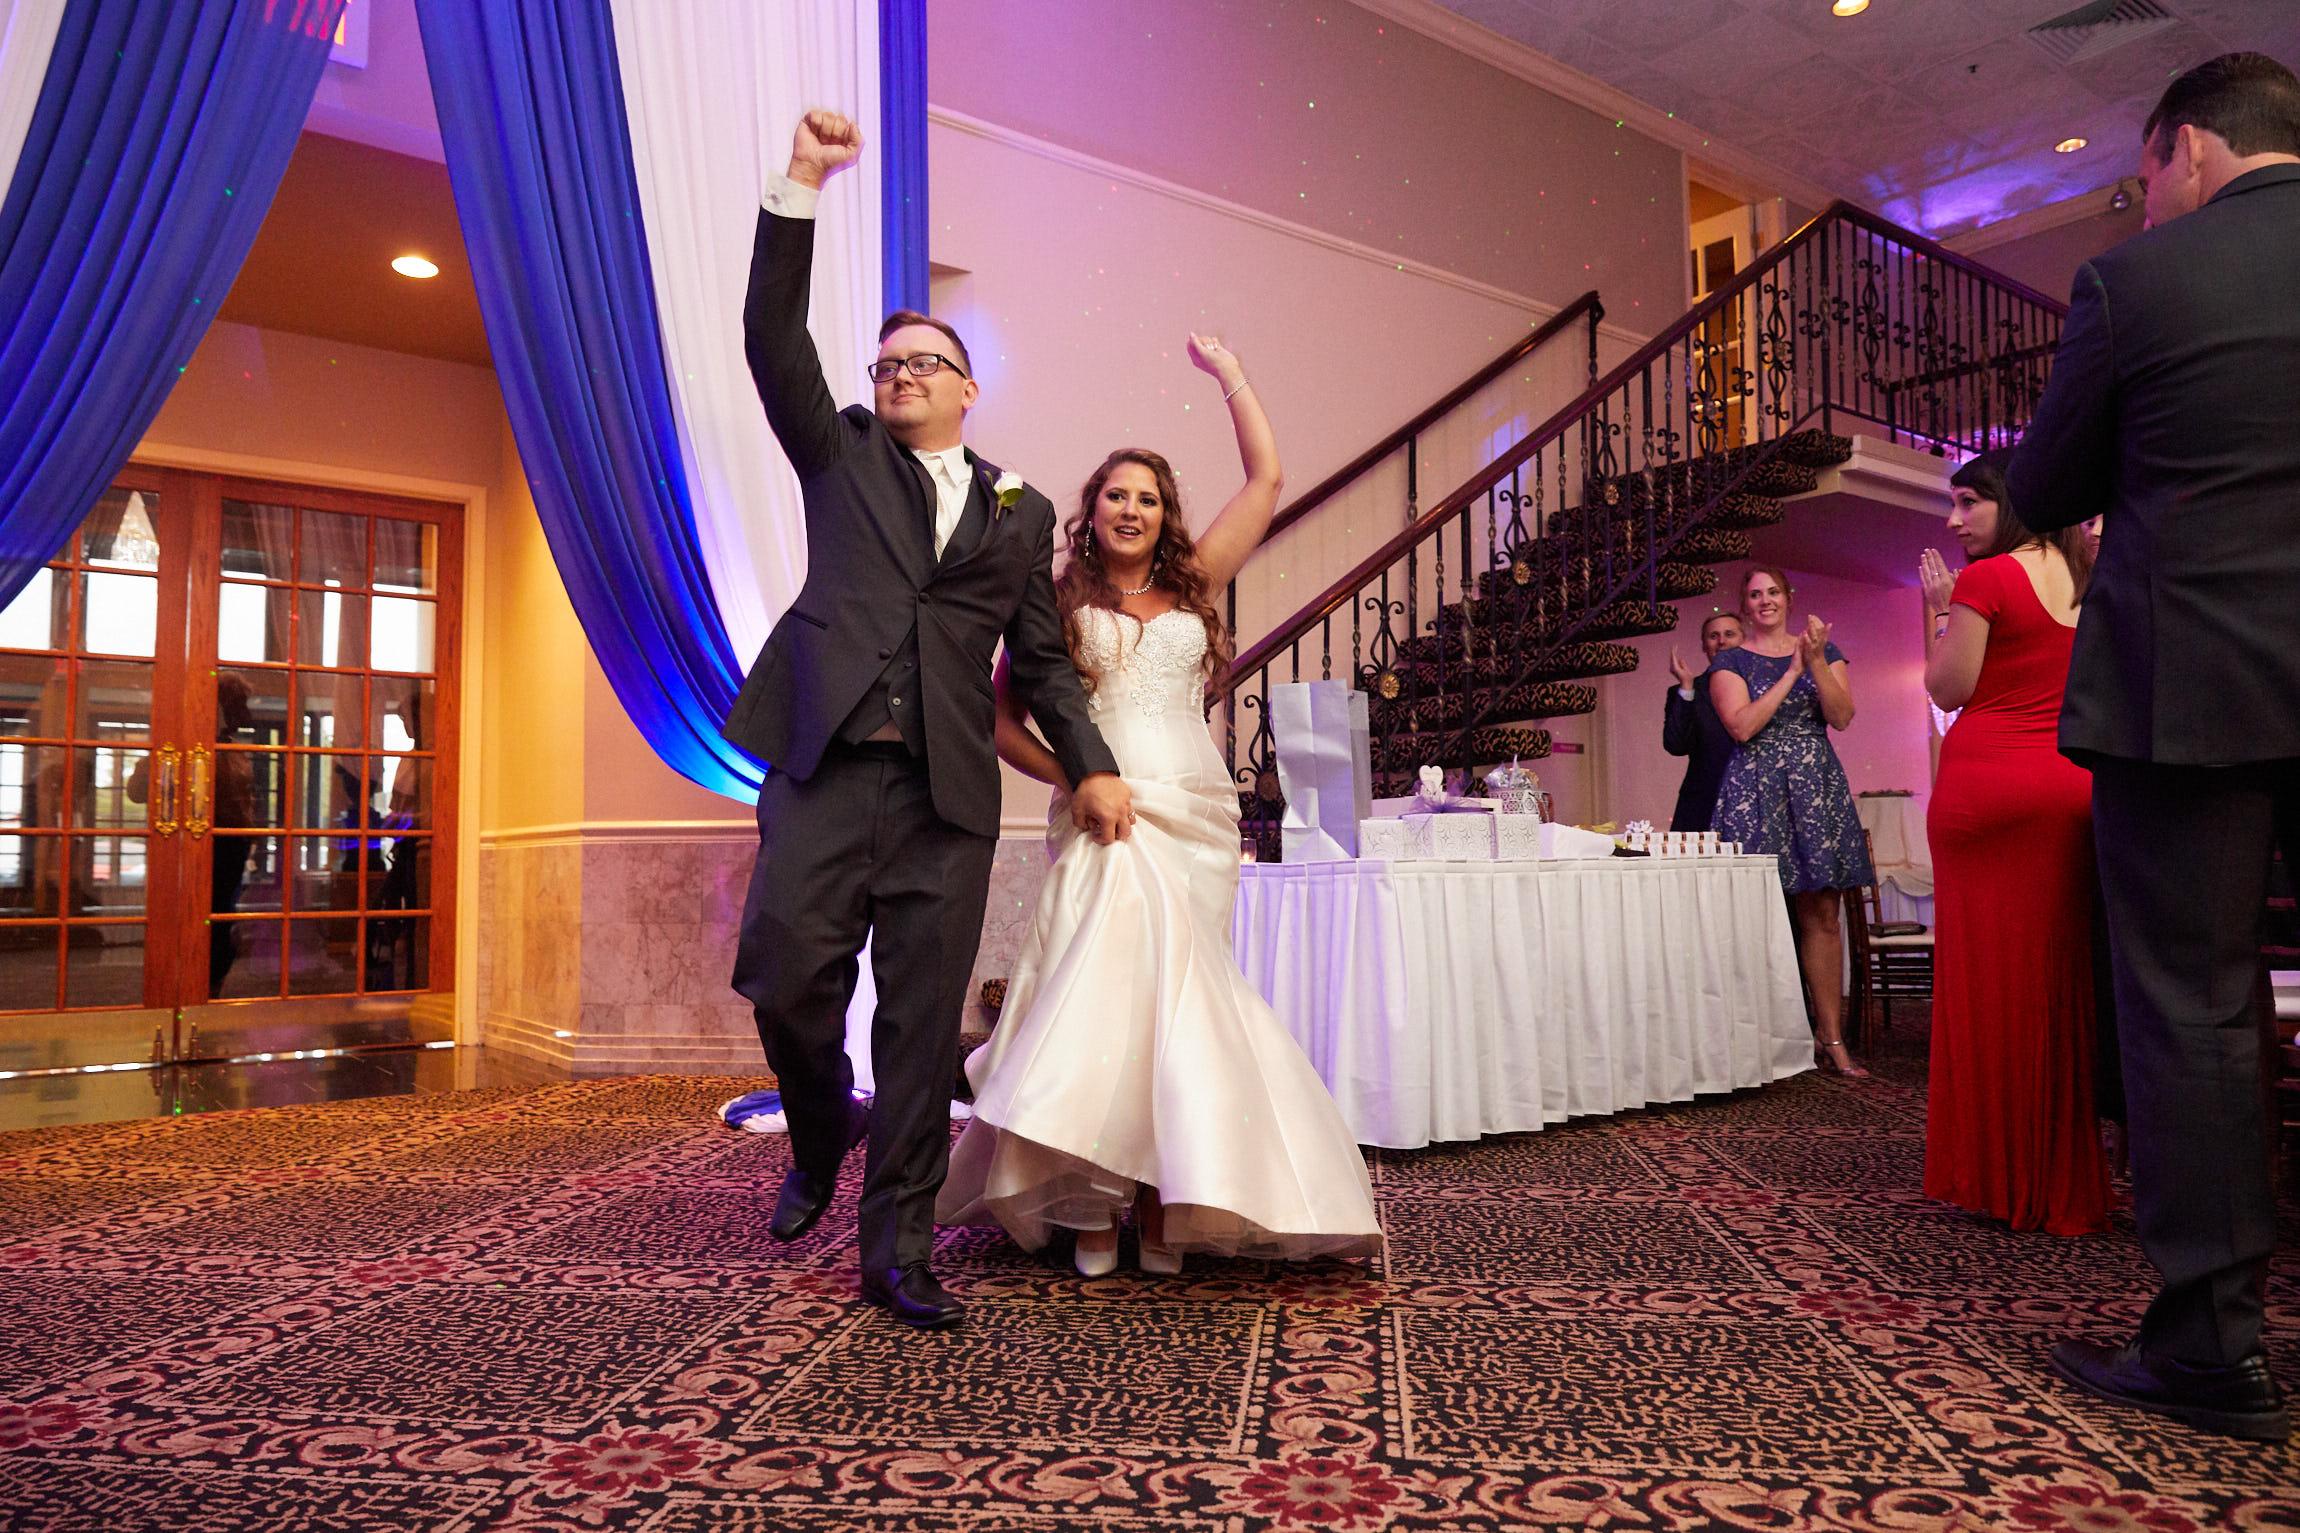 Bride and groom wedding reception introduction